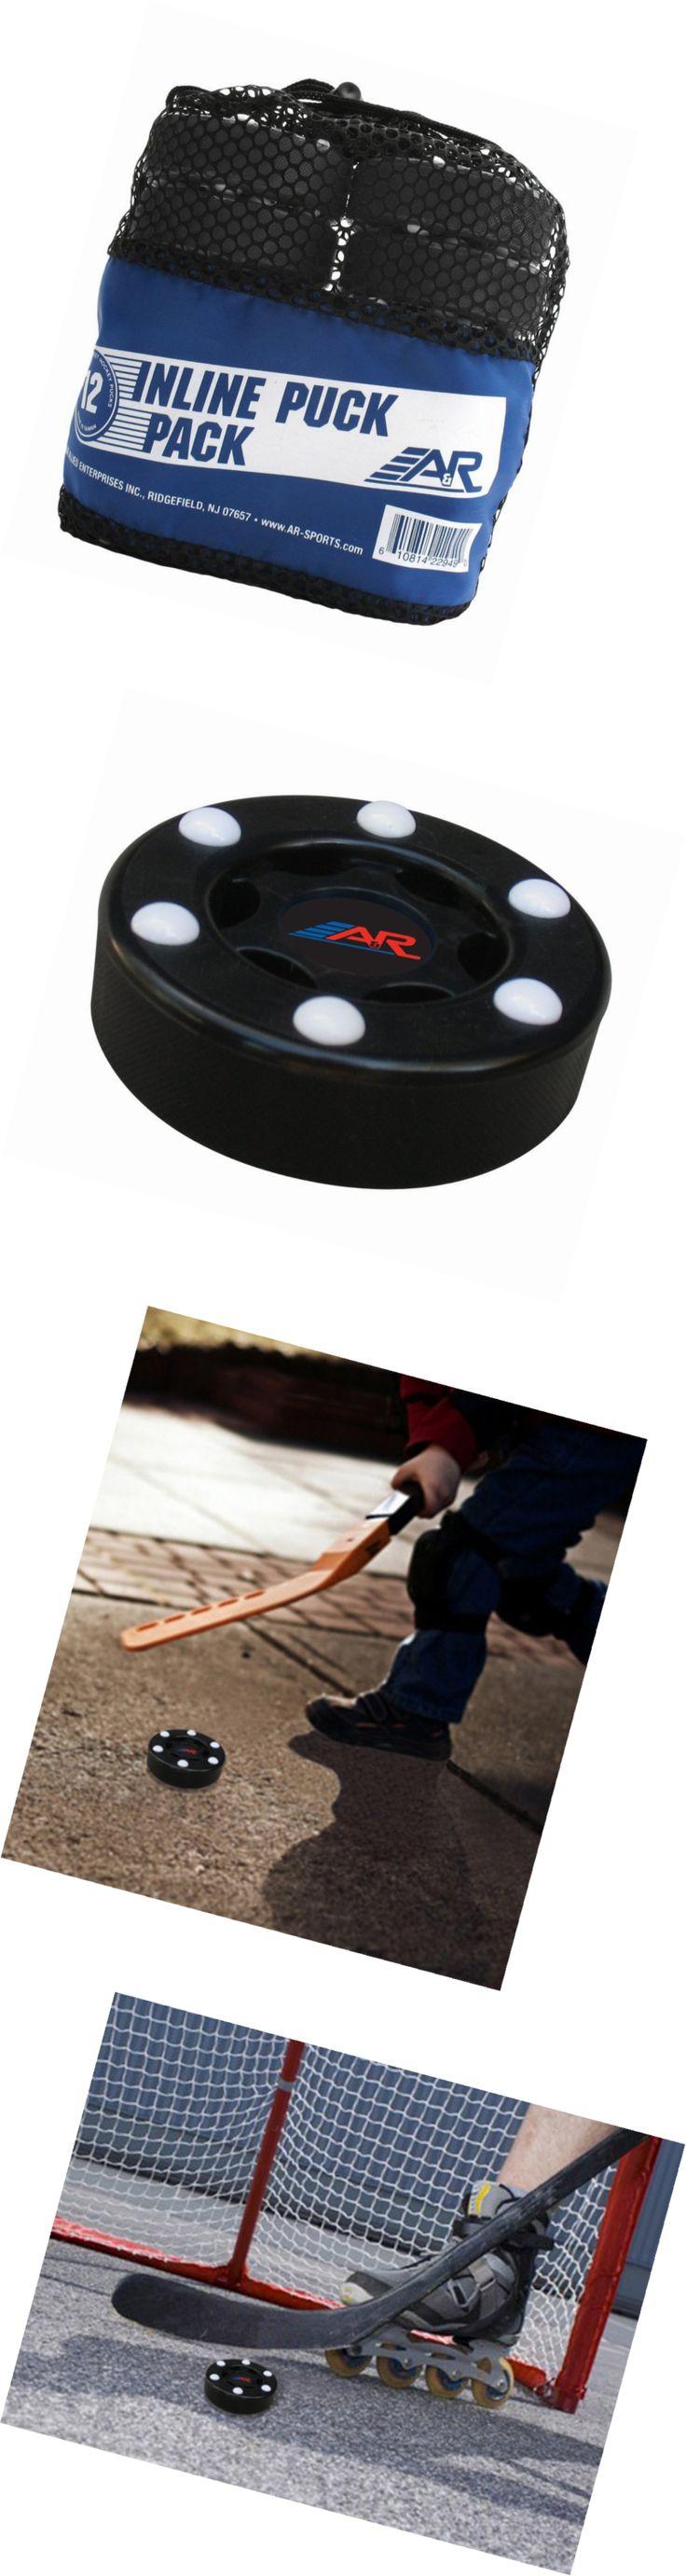 Pucks 108178: Aandr Sports Inline Street Hockey Puck (Pack Of 12) -> BUY IT NOW ONLY: $65.73 on eBay!